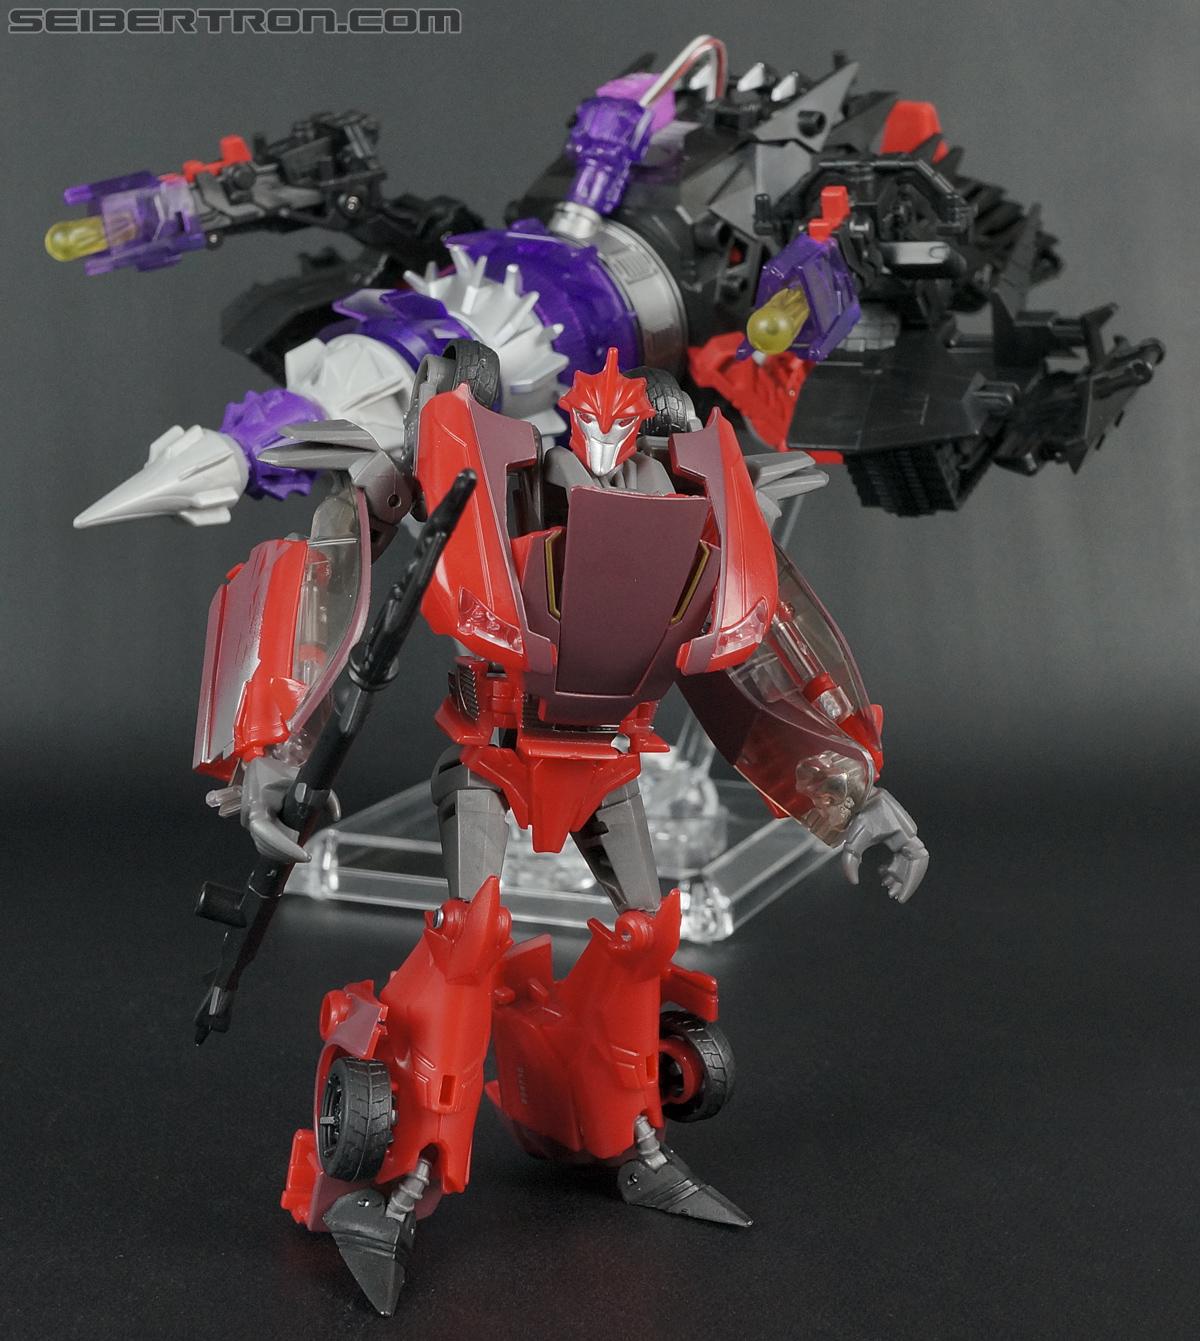 Transformers Prime: Cyberverse Energon Driller (Image #107 of 108)